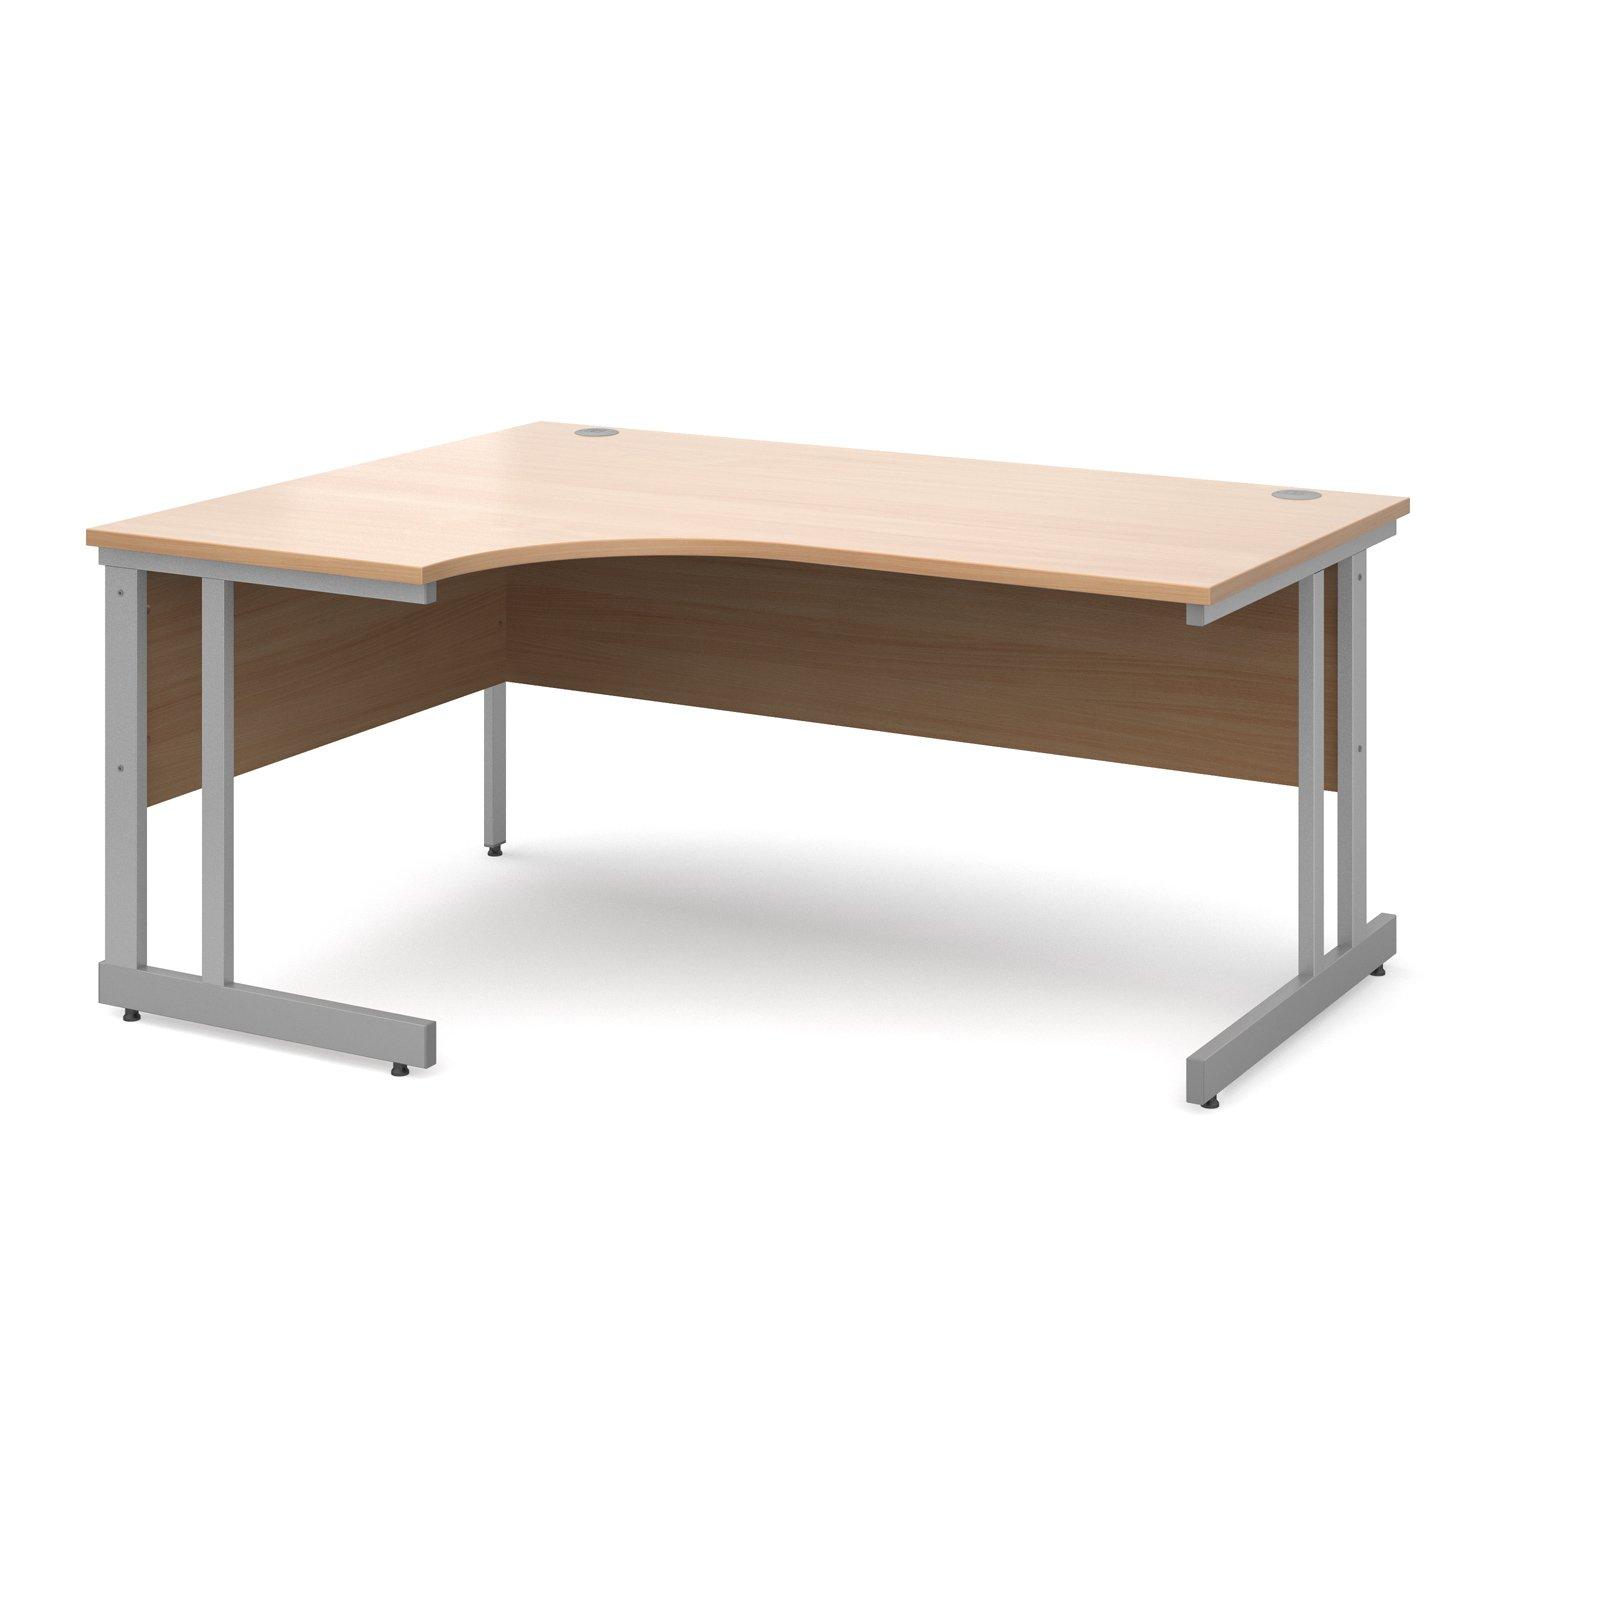 Momento left hand ergonomic desk 1600mm - silver cantilever frame, beech top